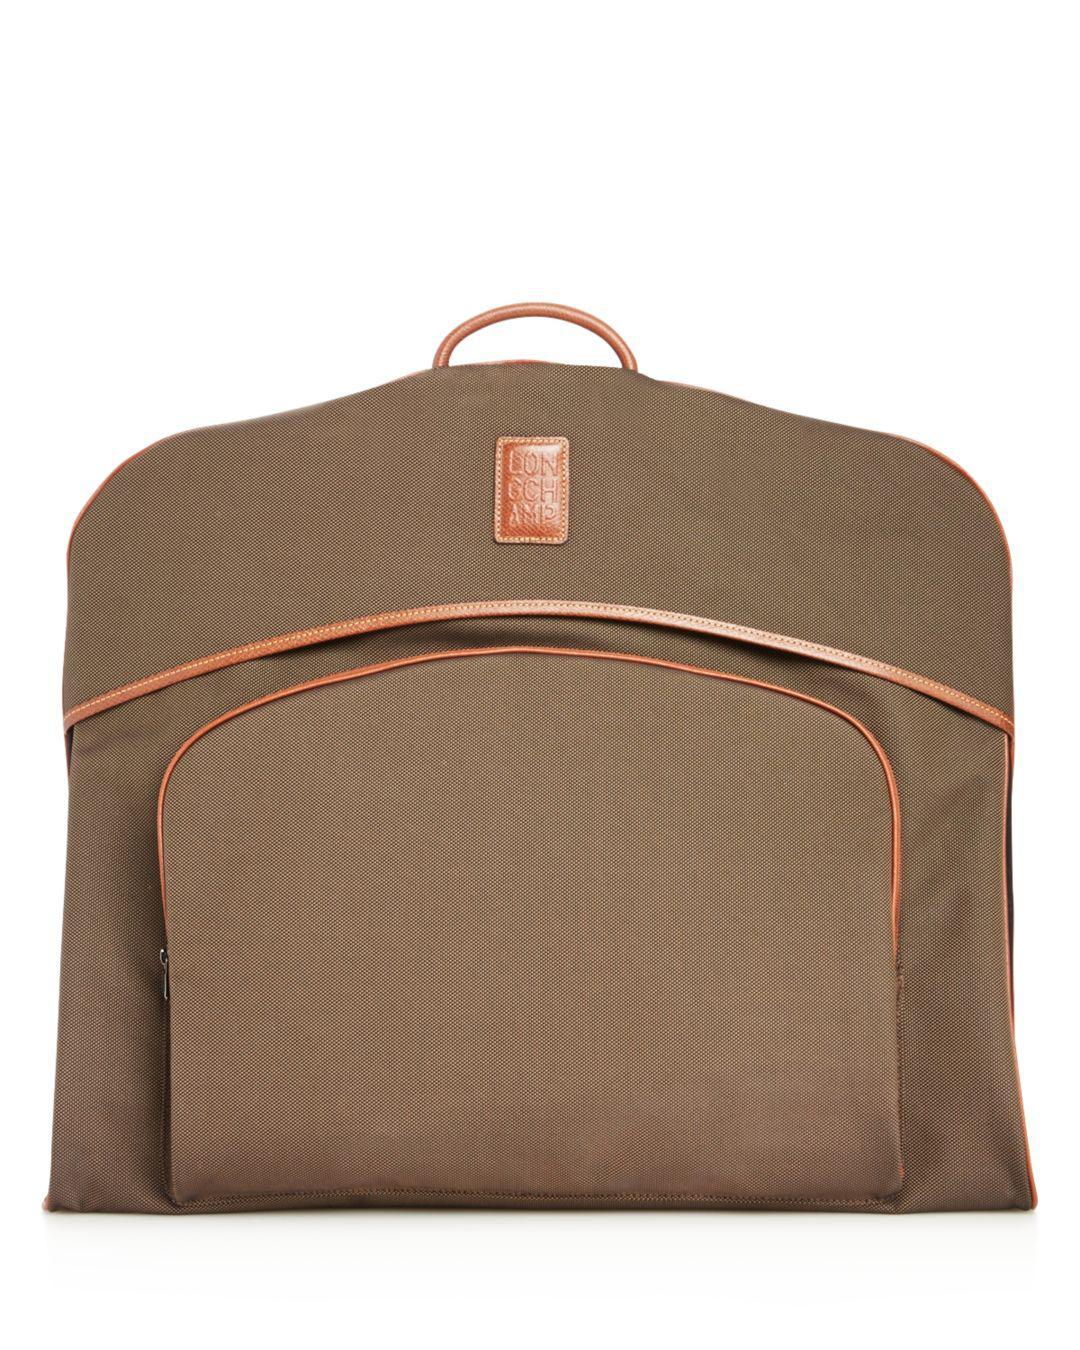 Lyst - Longchamp Boxford Garment Bag in Brown for Men 5051454bf219d